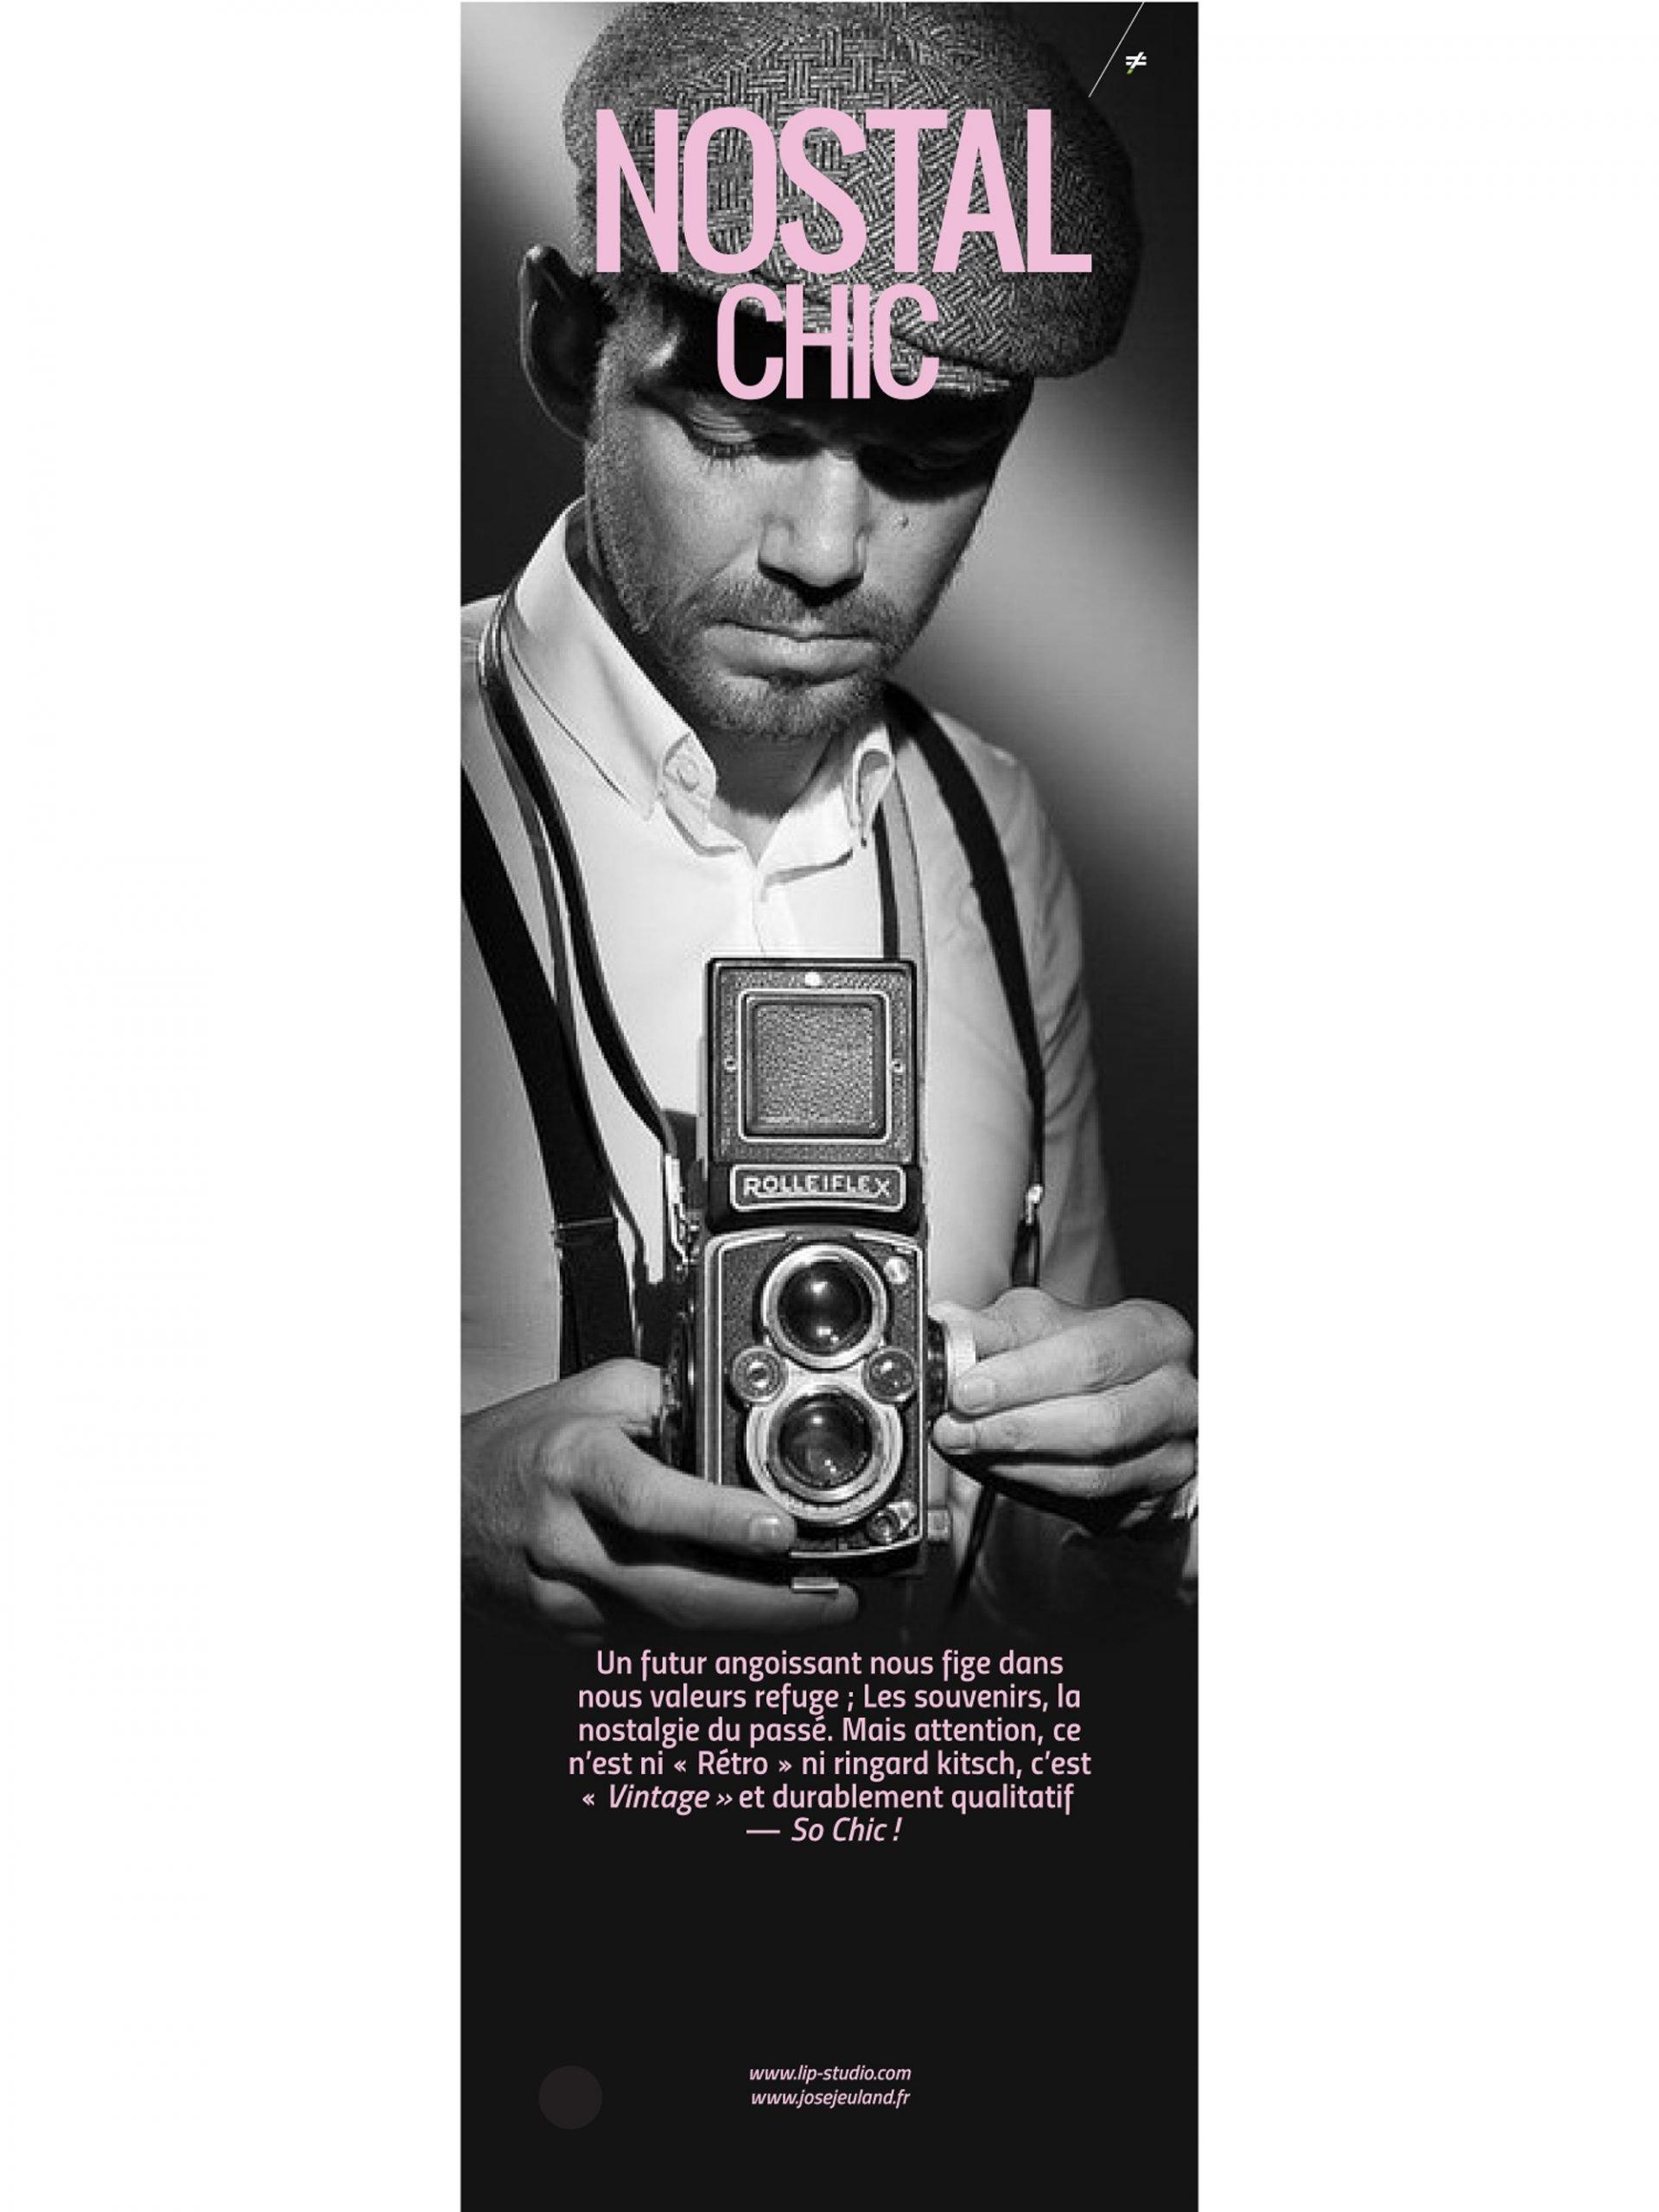 Nostalgic chic autrement jose jeuland film camera